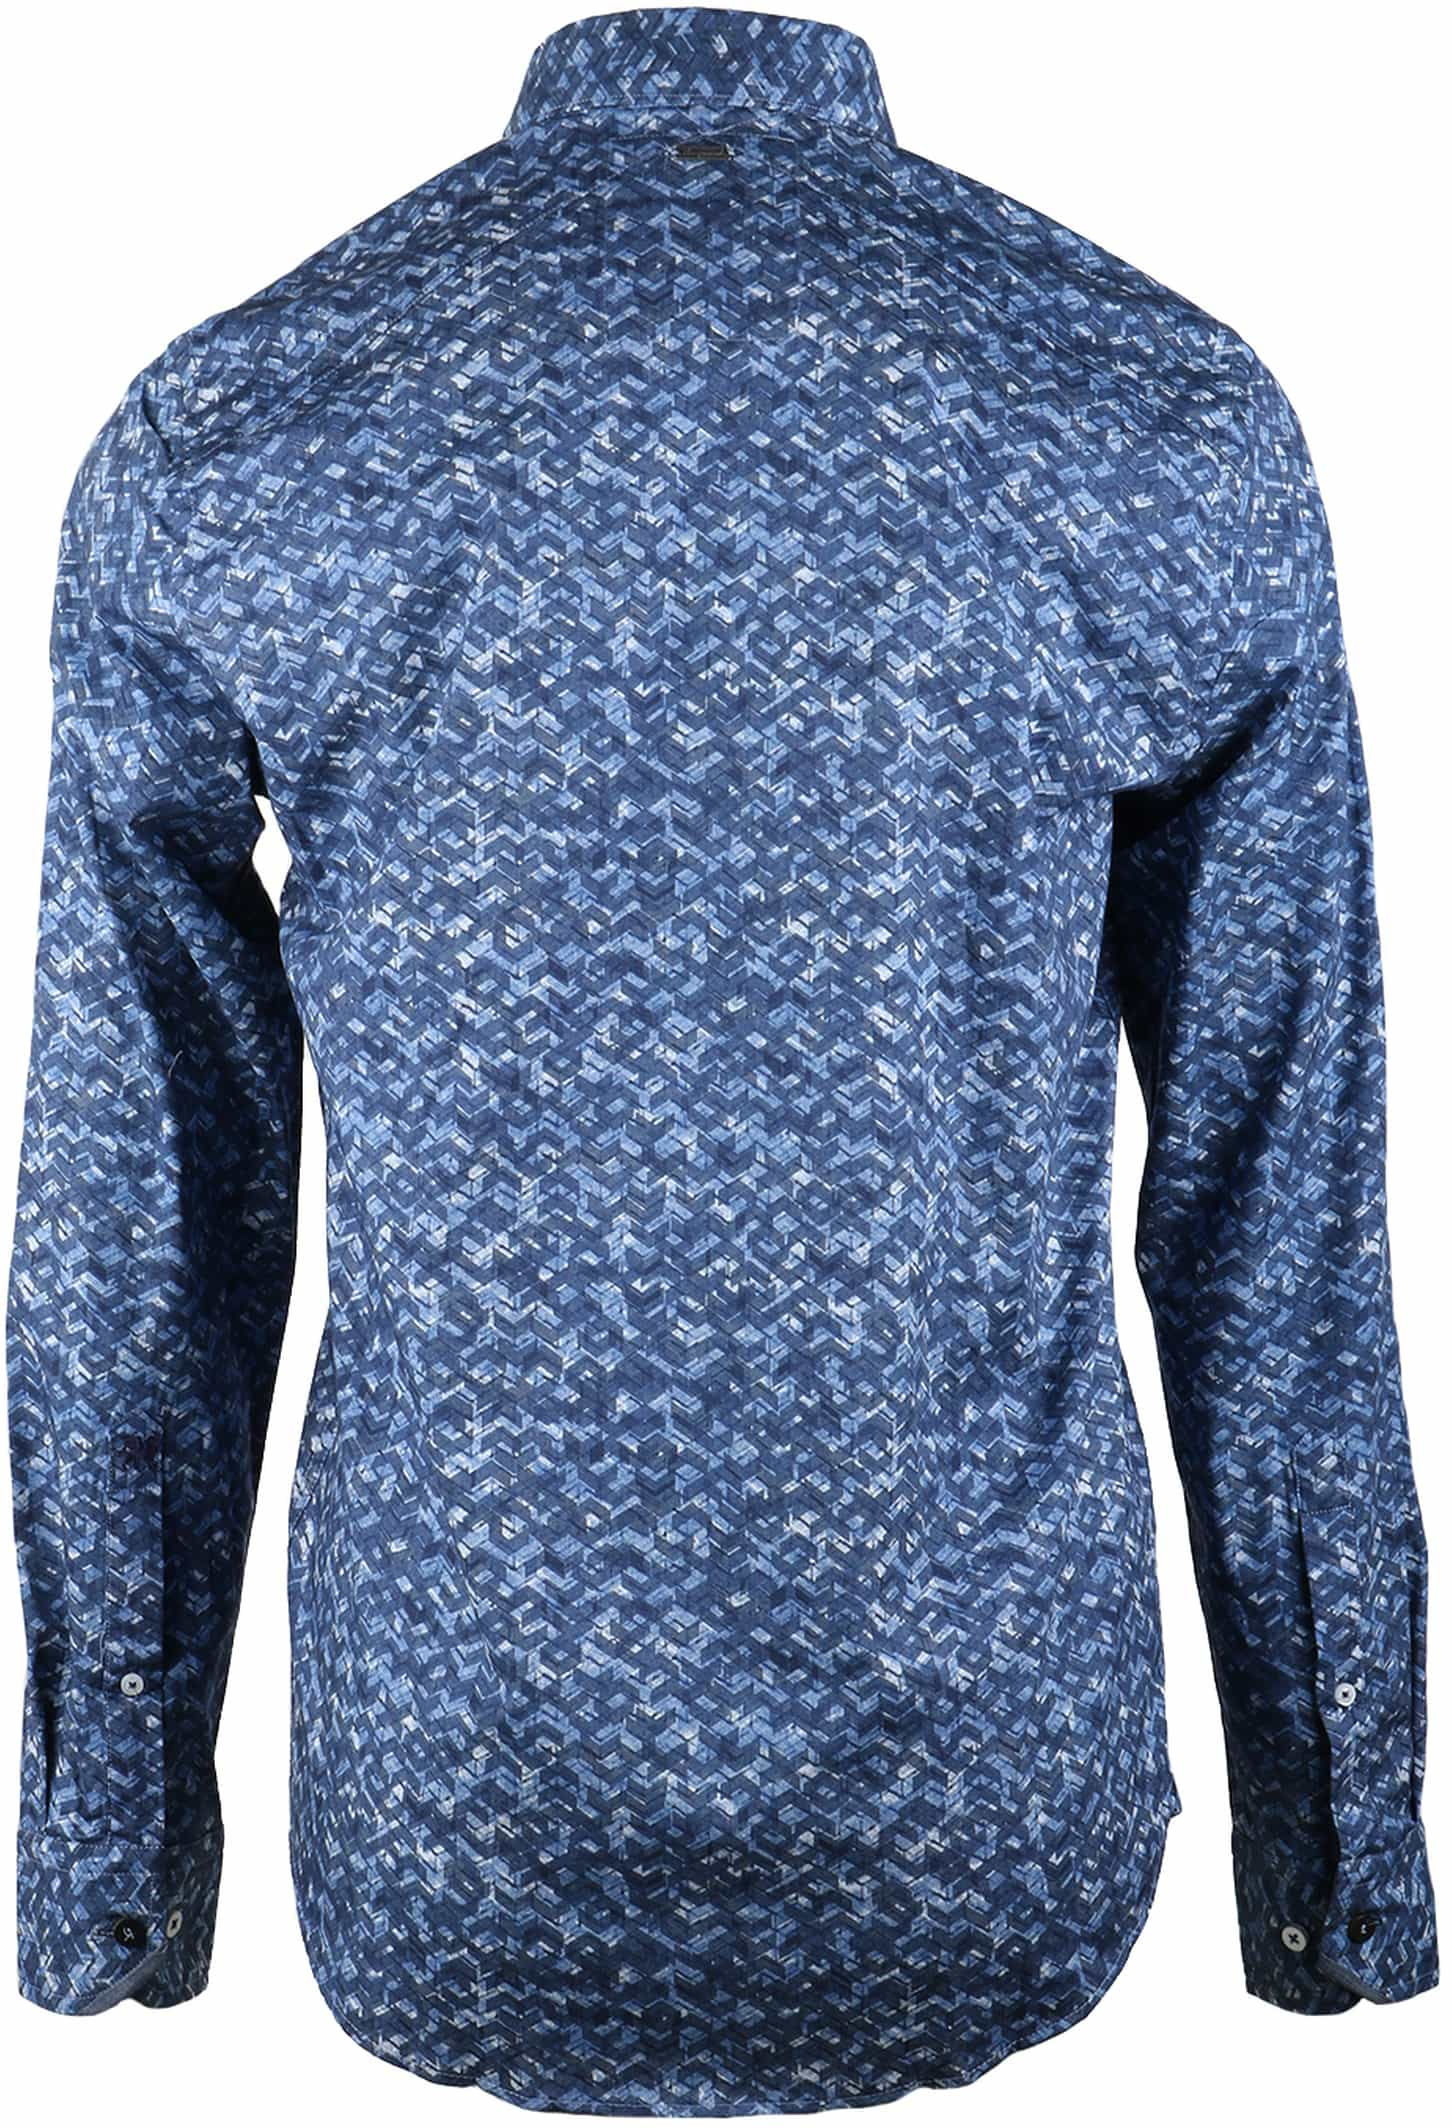 Vanguard Overhemd Blauwe Print foto 1